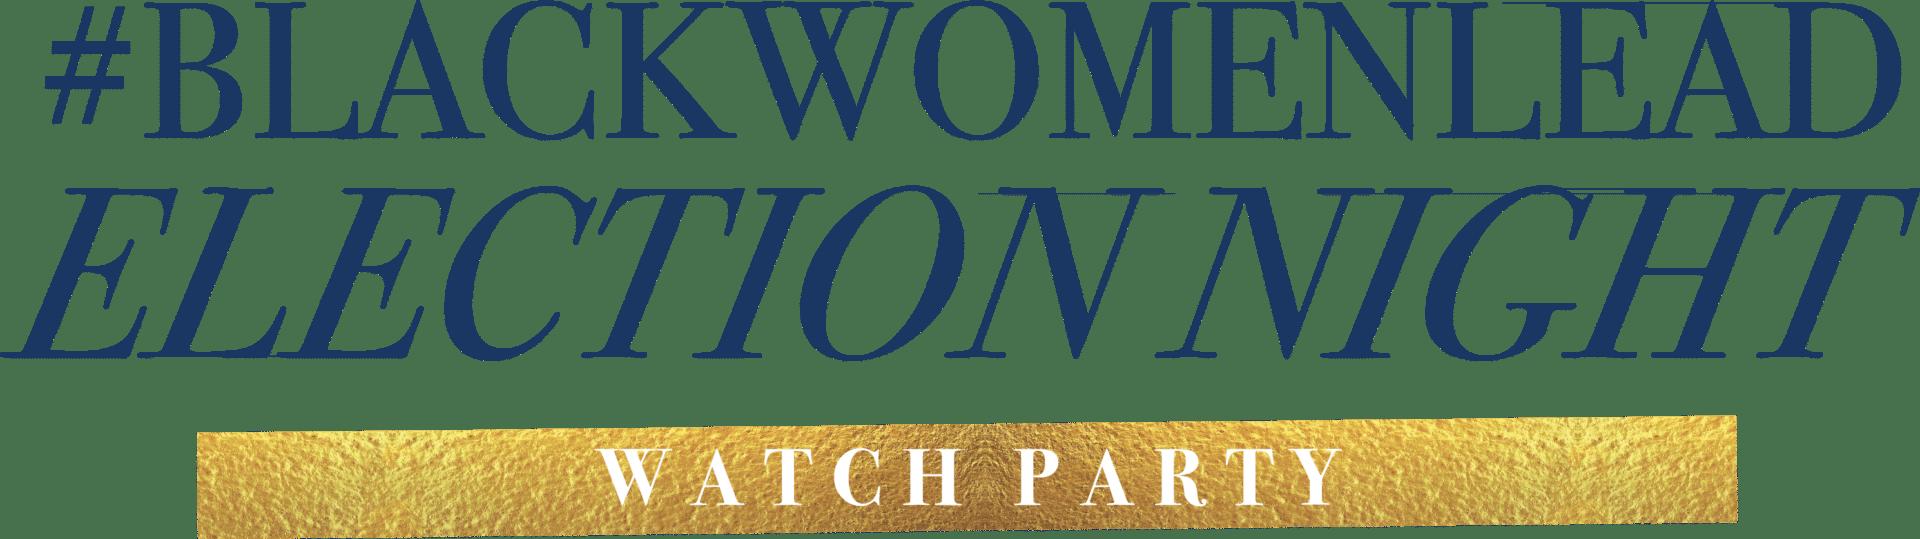 #BlackWomenLead Election Night Watch Party